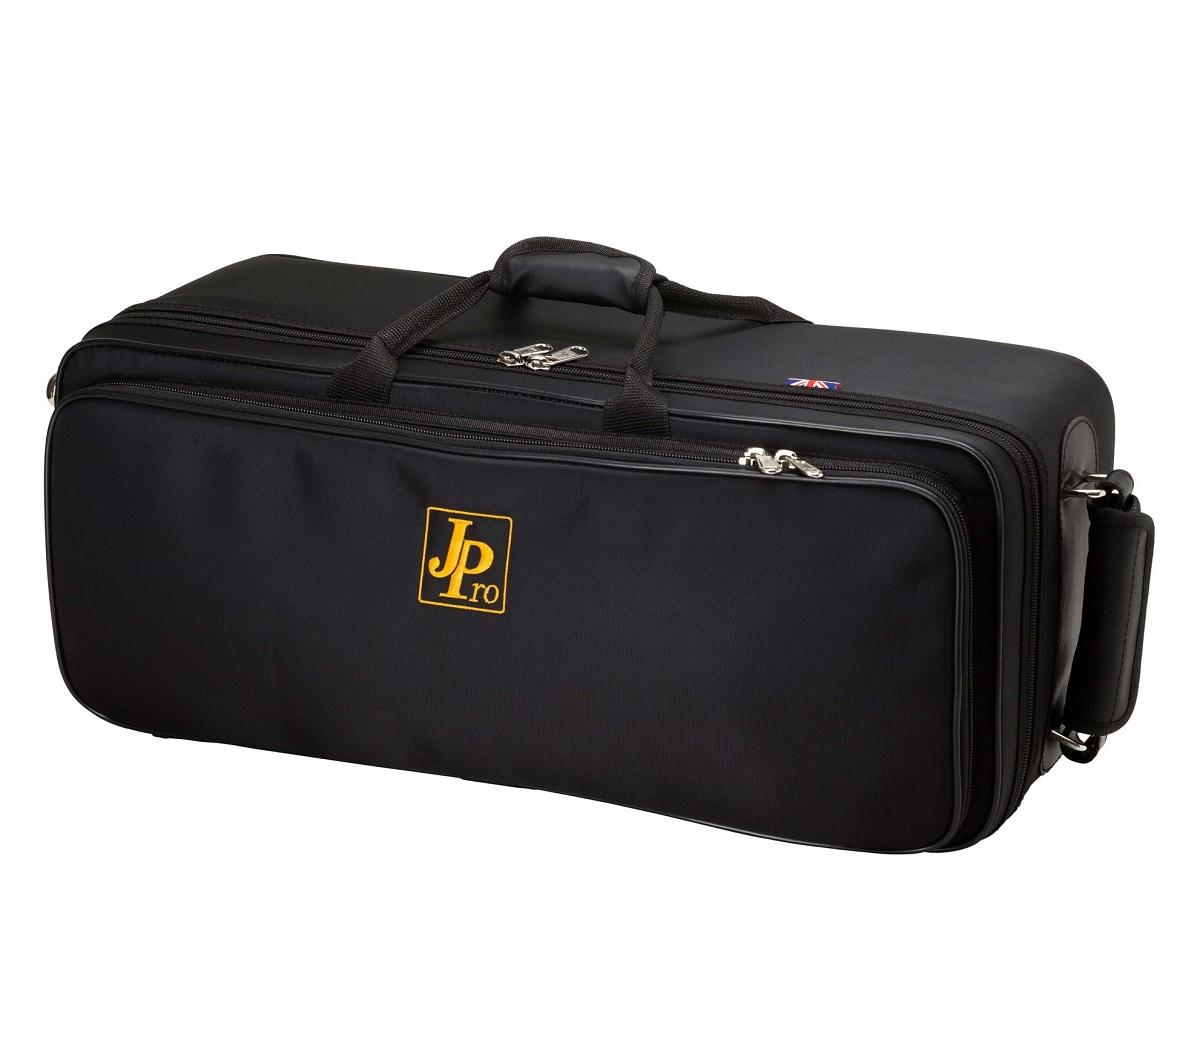 jp pro double cornet case jp851 duchy brass instruments for sale. Black Bedroom Furniture Sets. Home Design Ideas